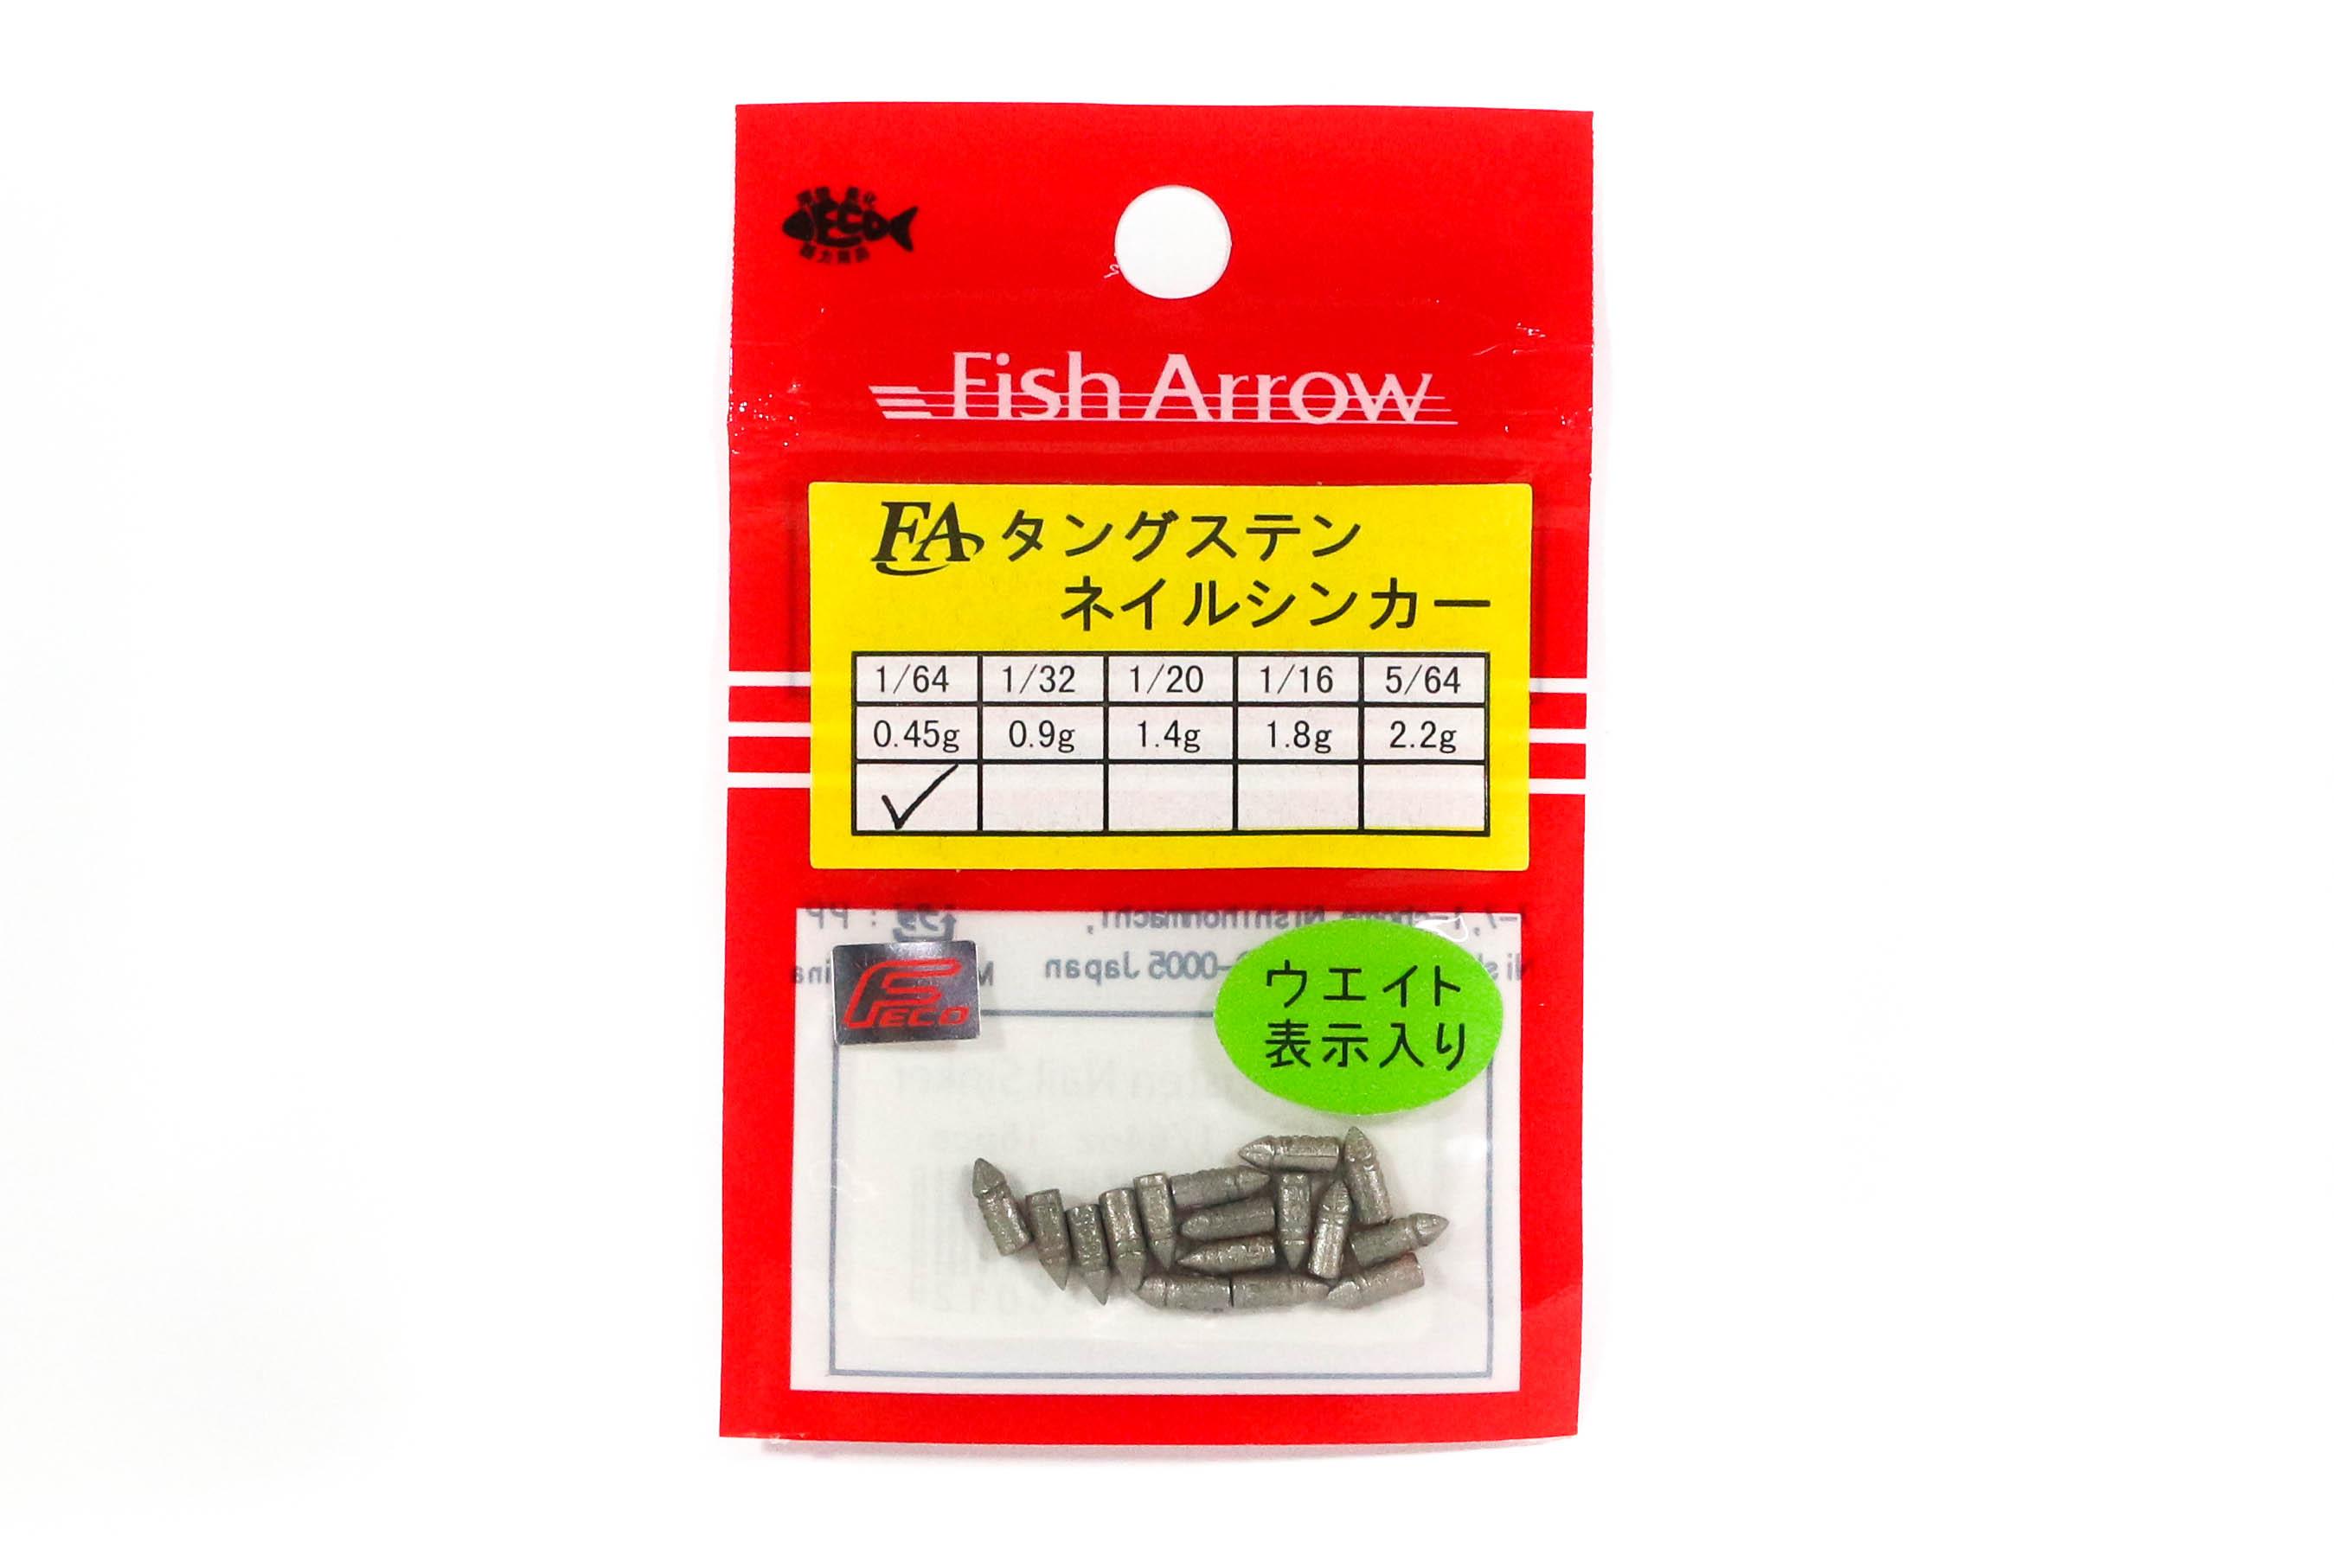 Fish Arrow Nail Sinker 0.45 grams 16 pieces per pack (6012)